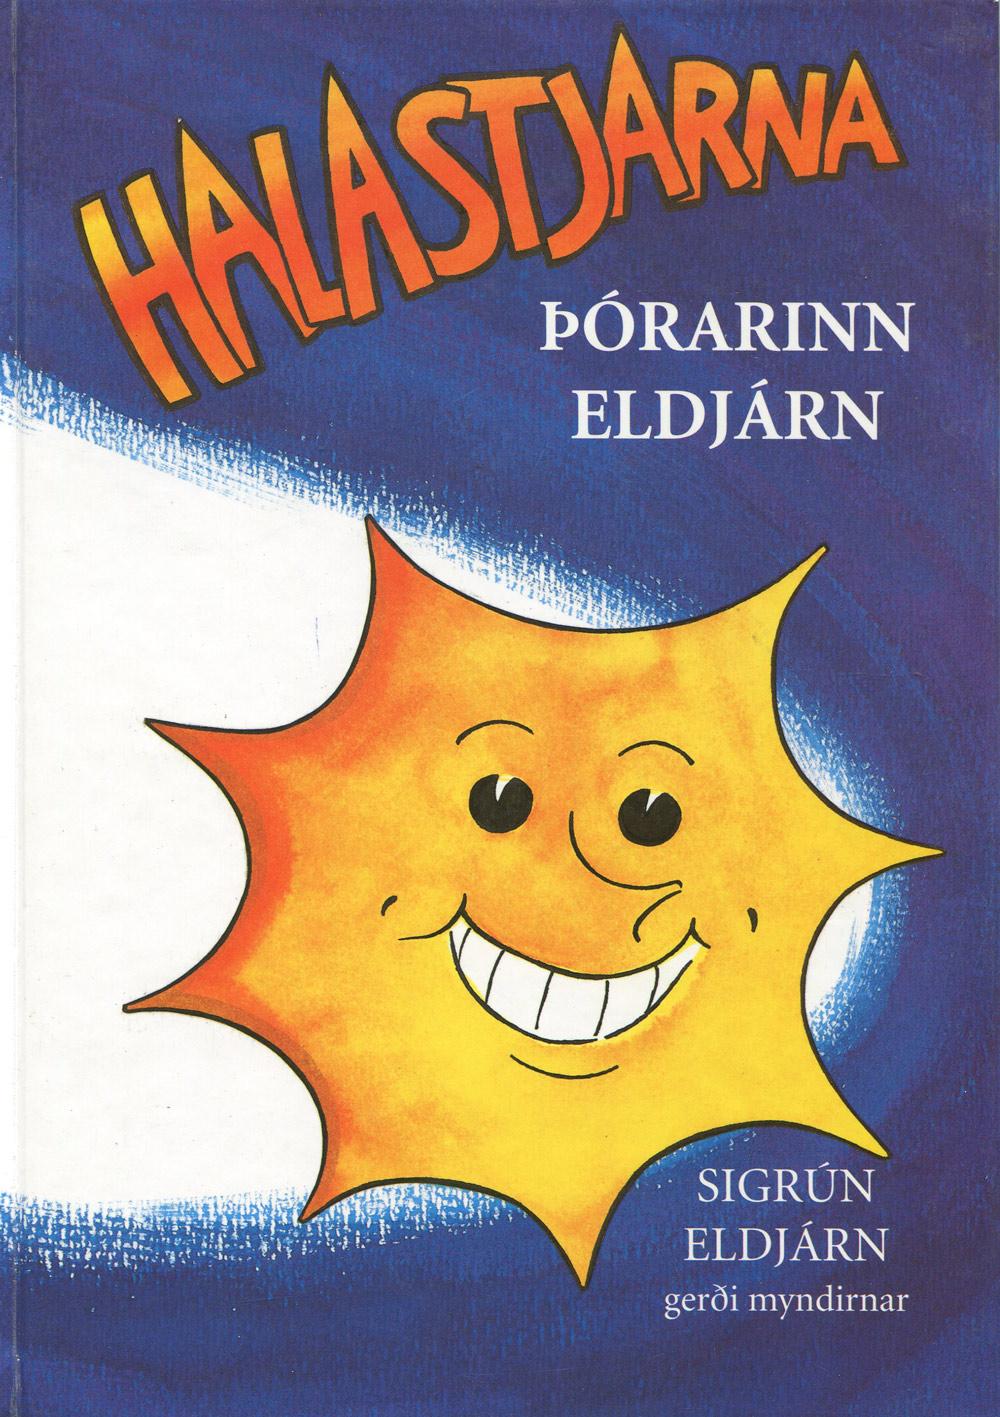 Halastjarna (1997) kápumynd